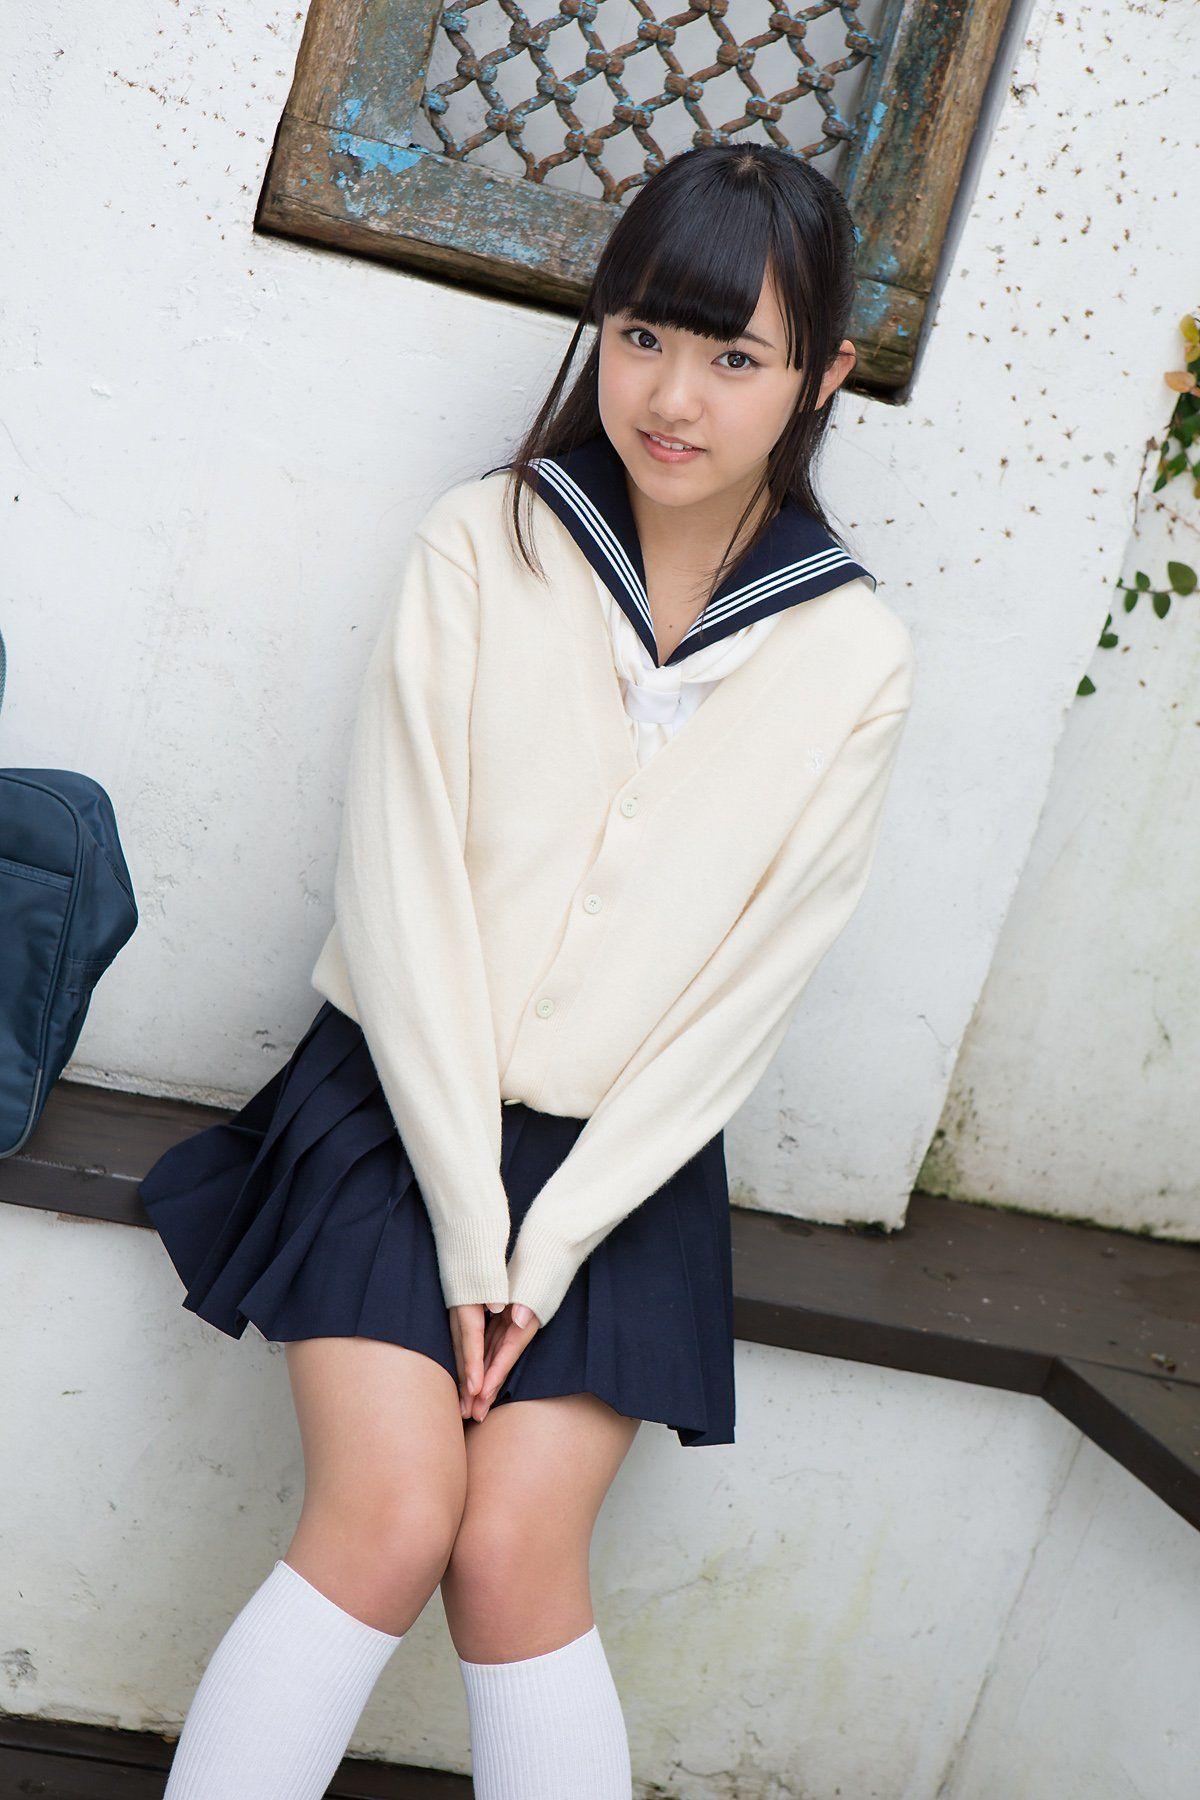 how to look pretty in school uniform